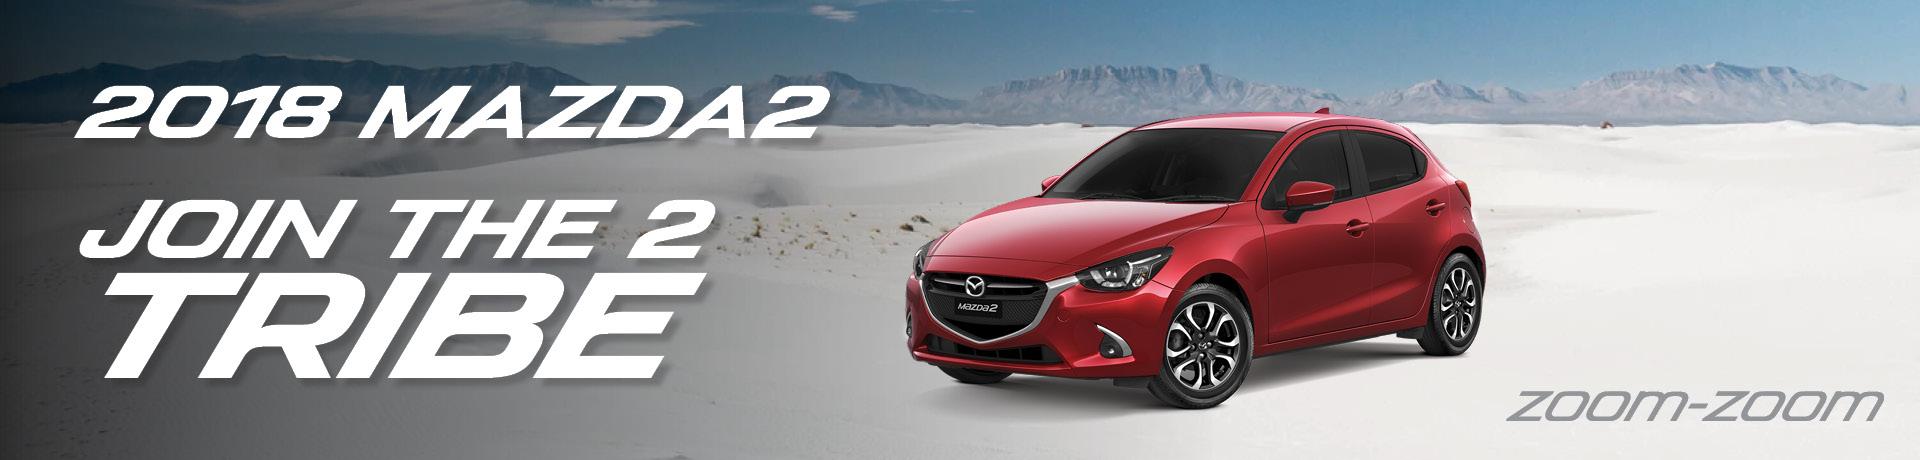 Mazda 3 Service Manual: Automatic